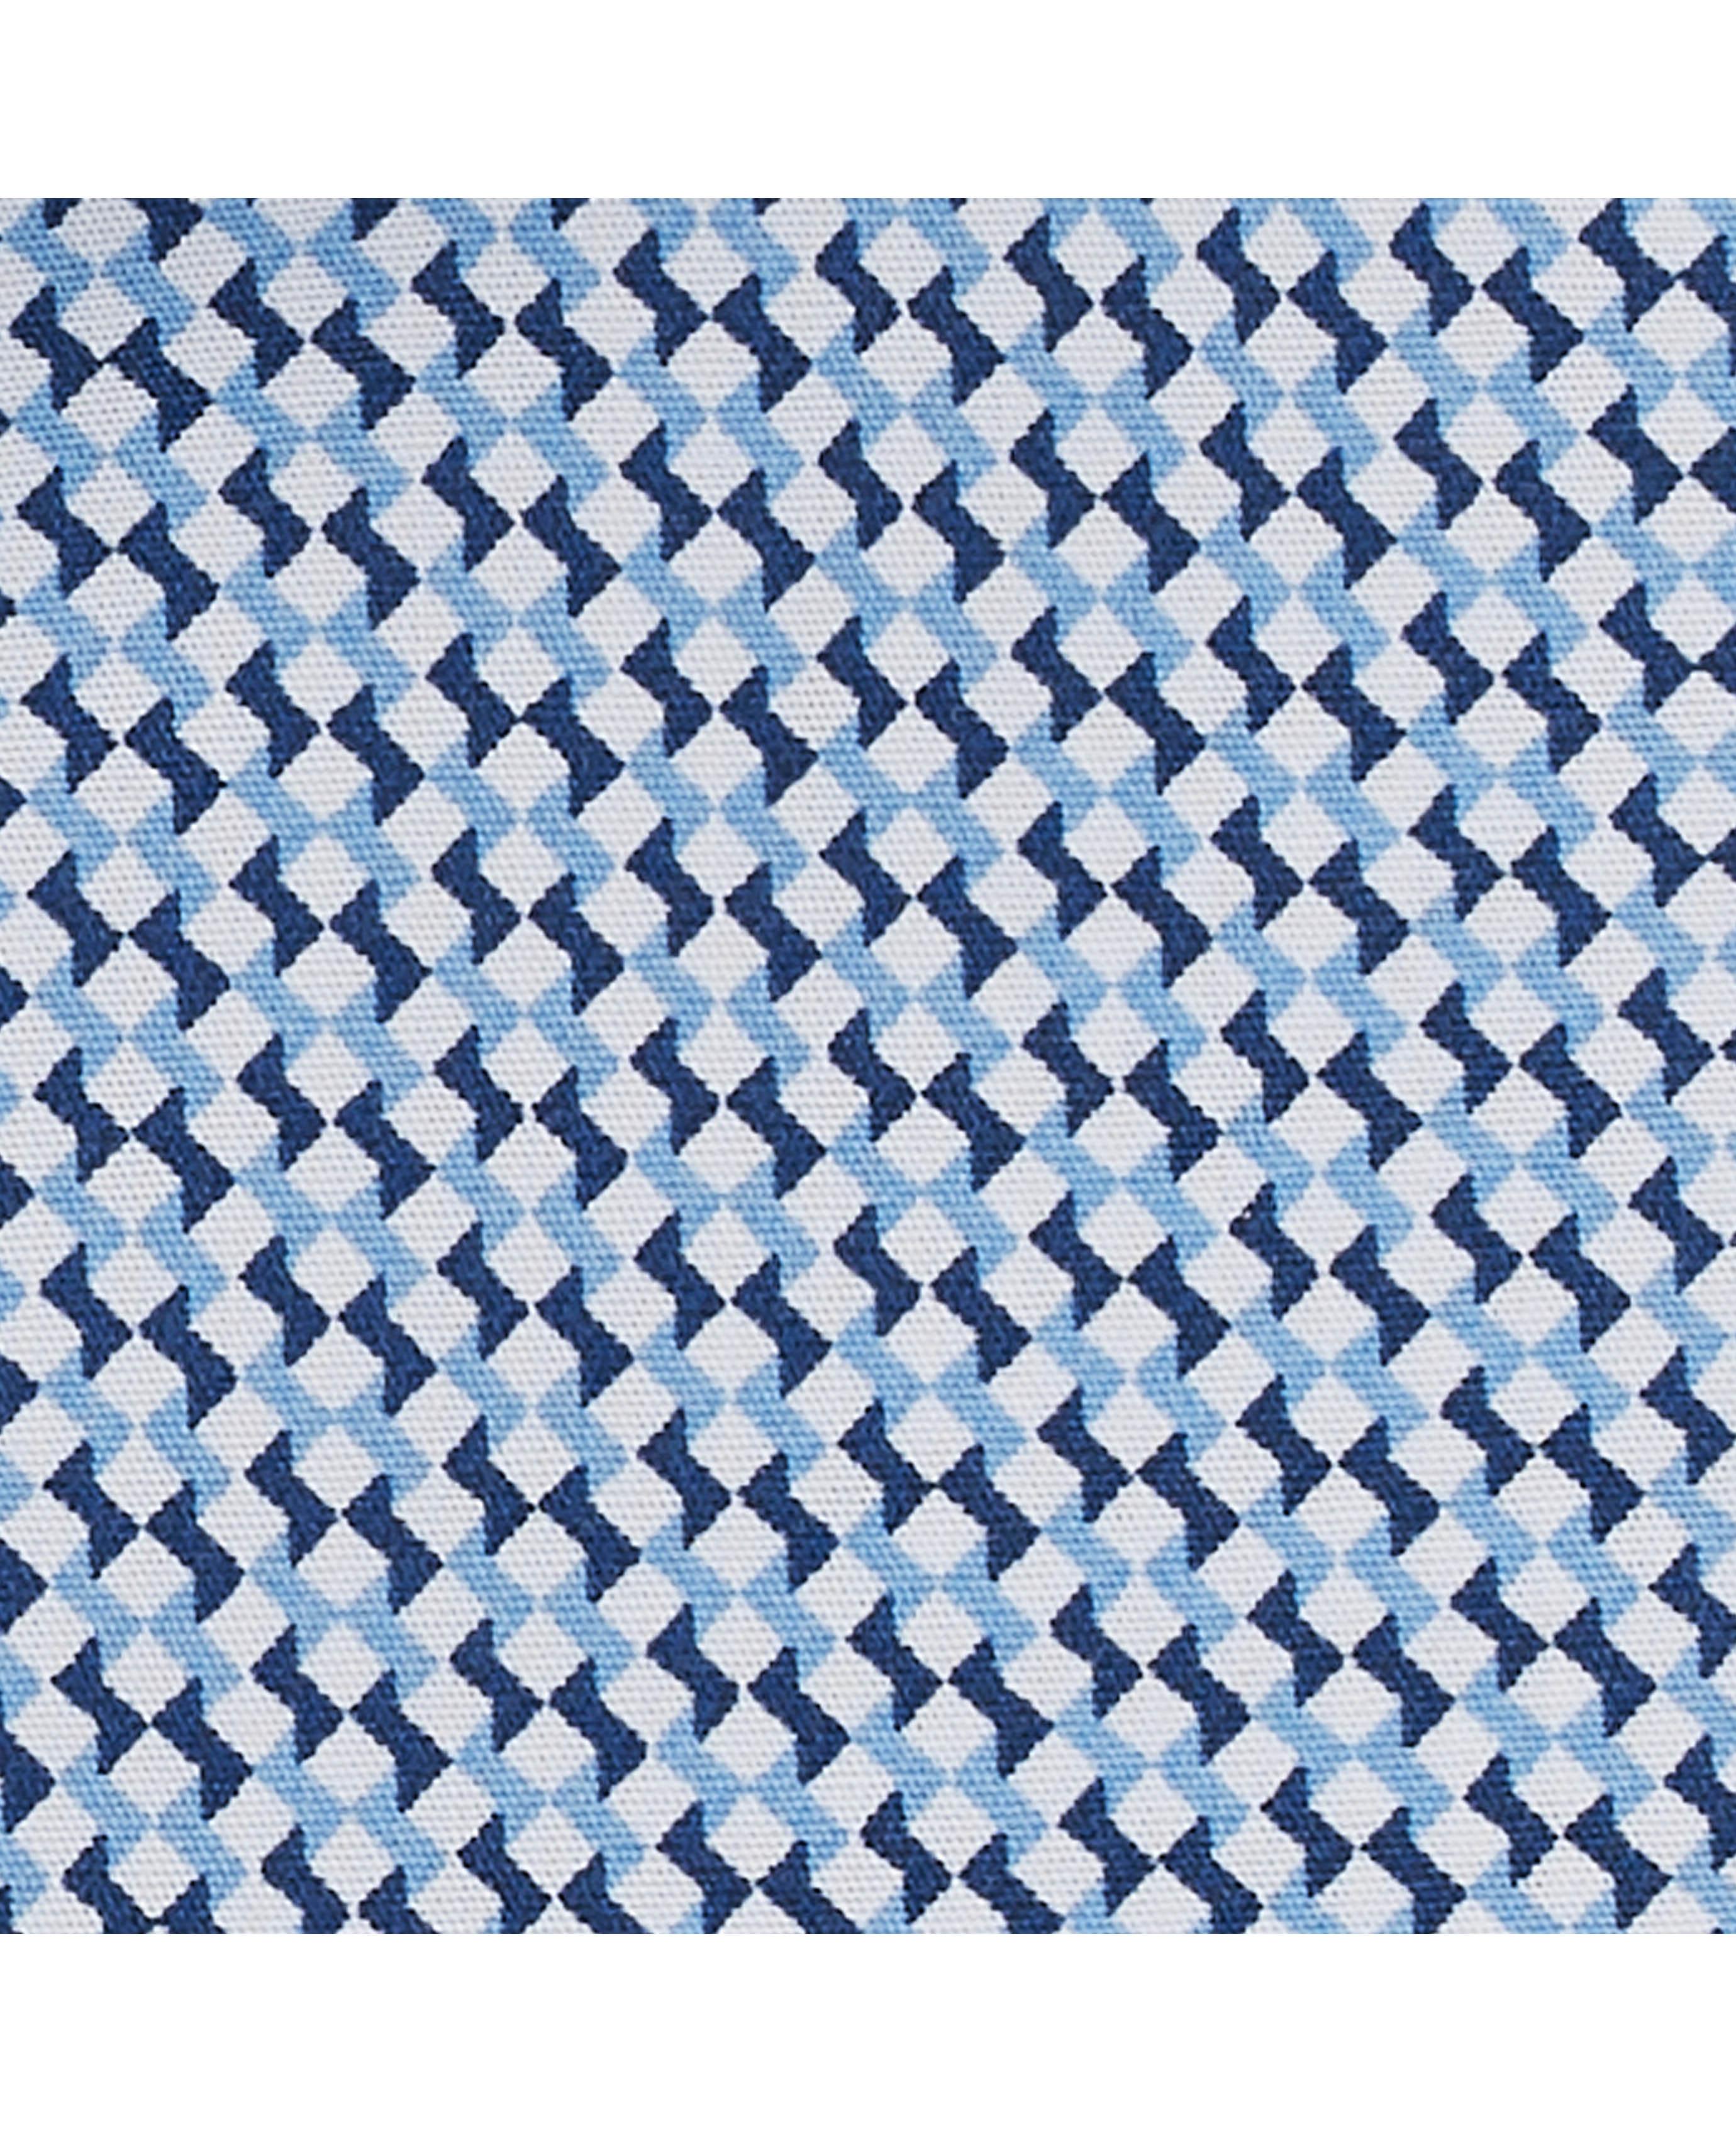 Savile-Row-Men-039-s-White-Blue-Geo-Print-Slim-Fit-Shirt-Single-Cuff thumbnail 5